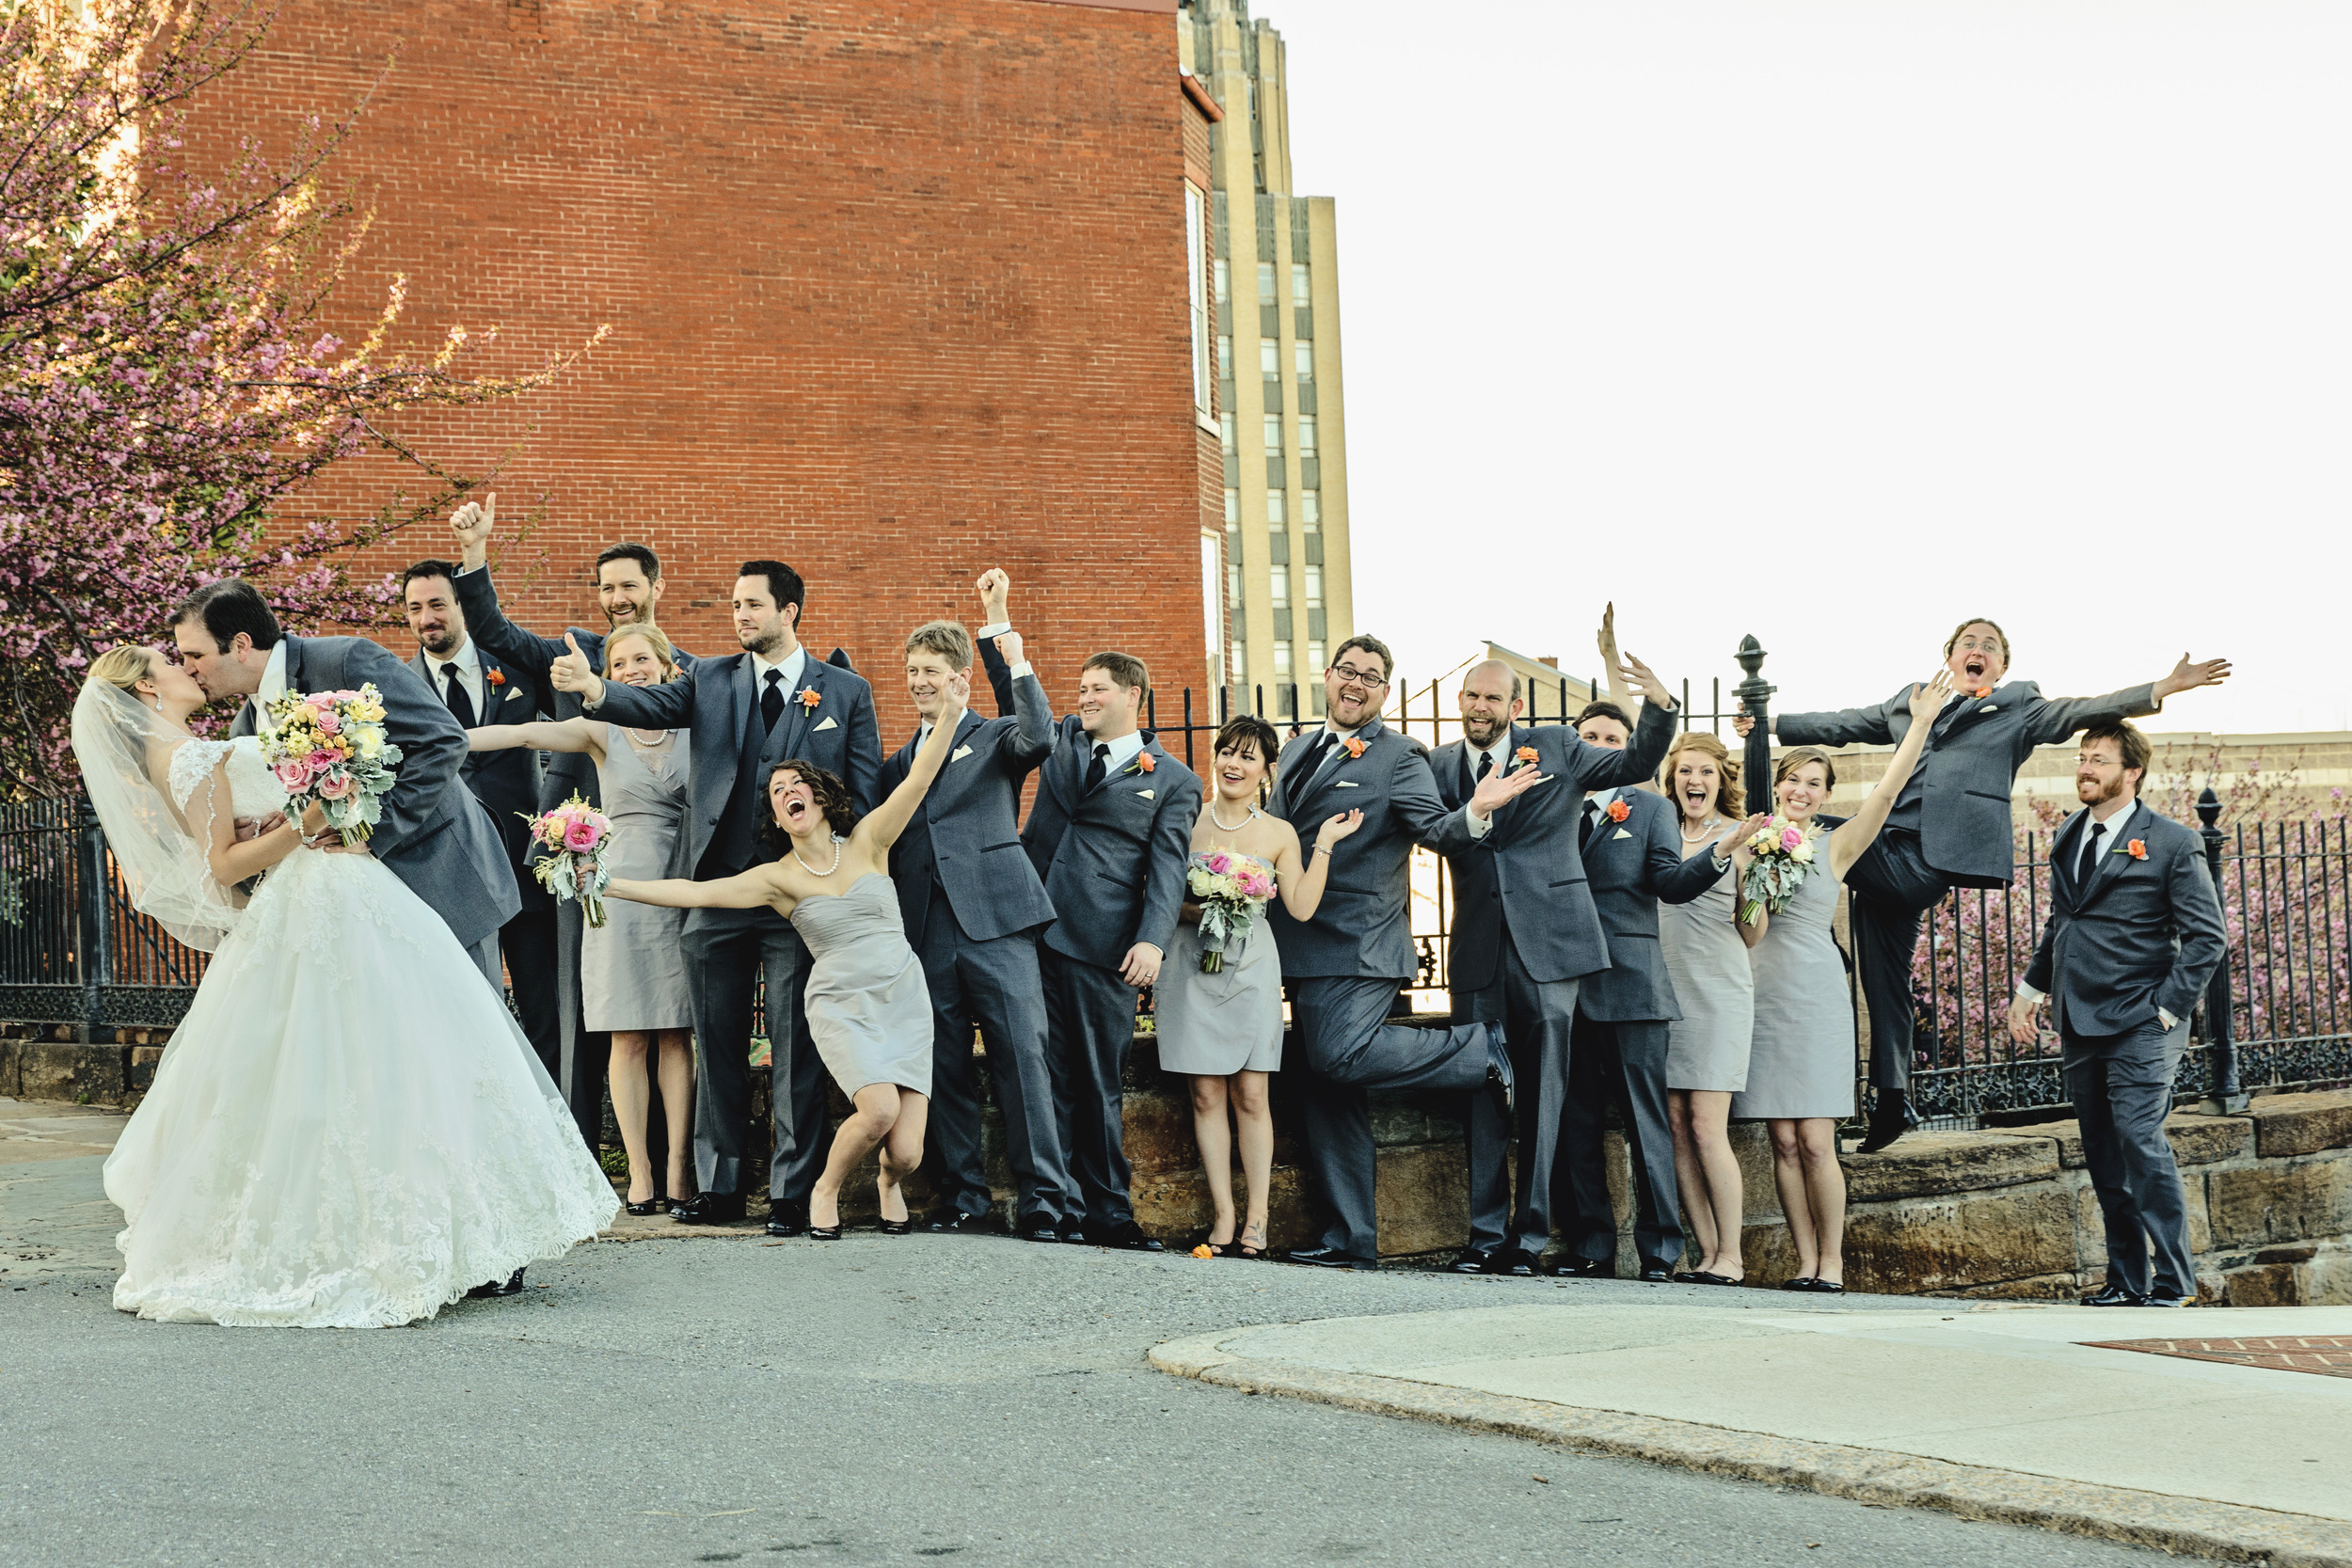 tresca_elegant_downtown_wedding_lynchburg_va027.jpg